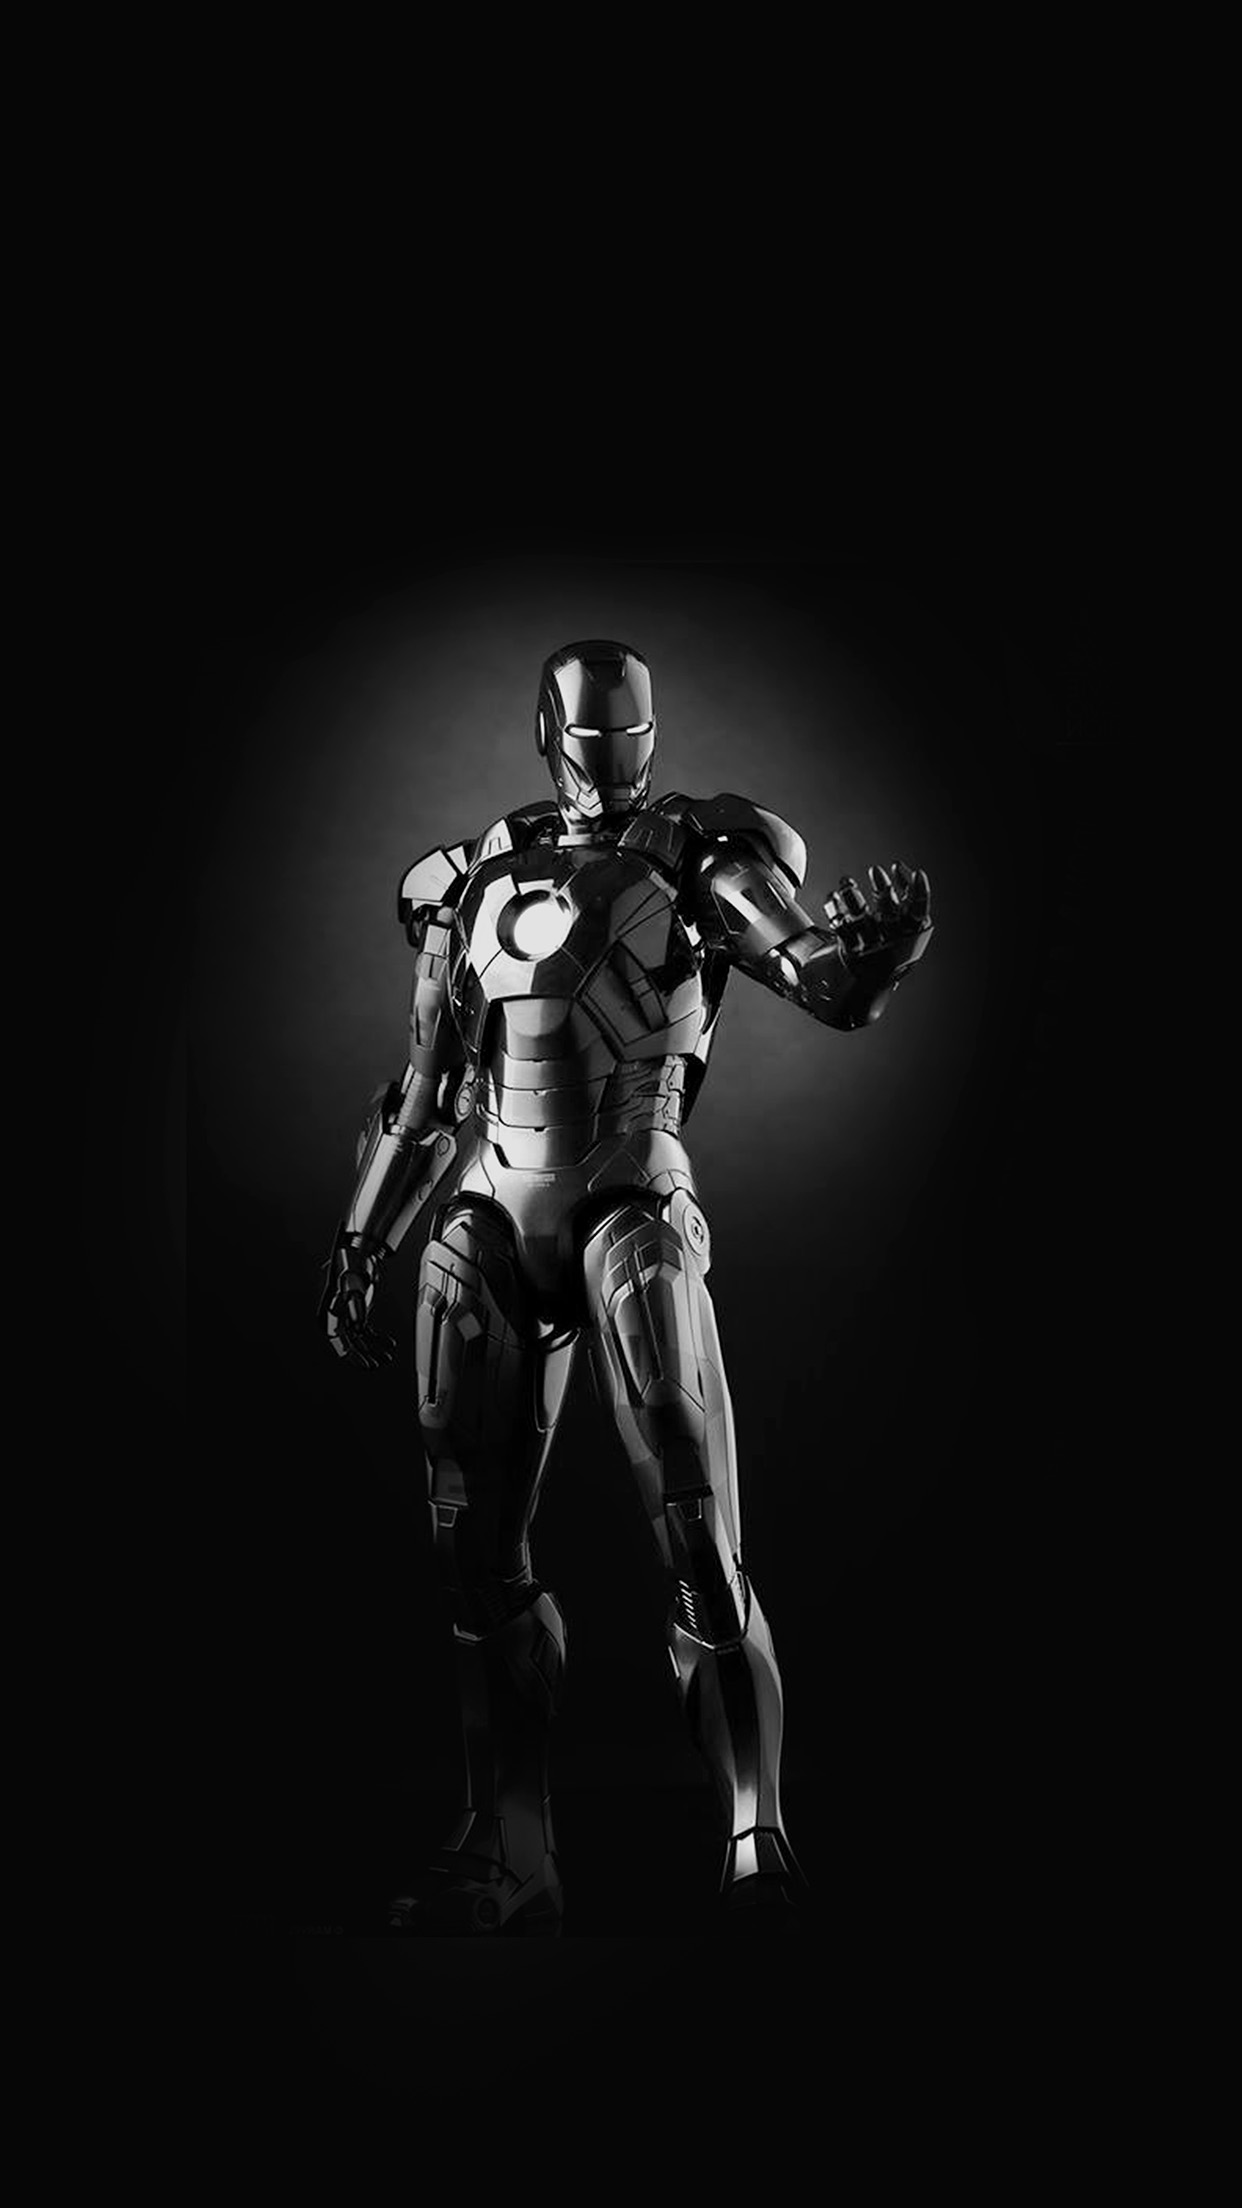 Iphone7papers Com Iphone7 Wallpaper Am00 Ironman Dark Figure